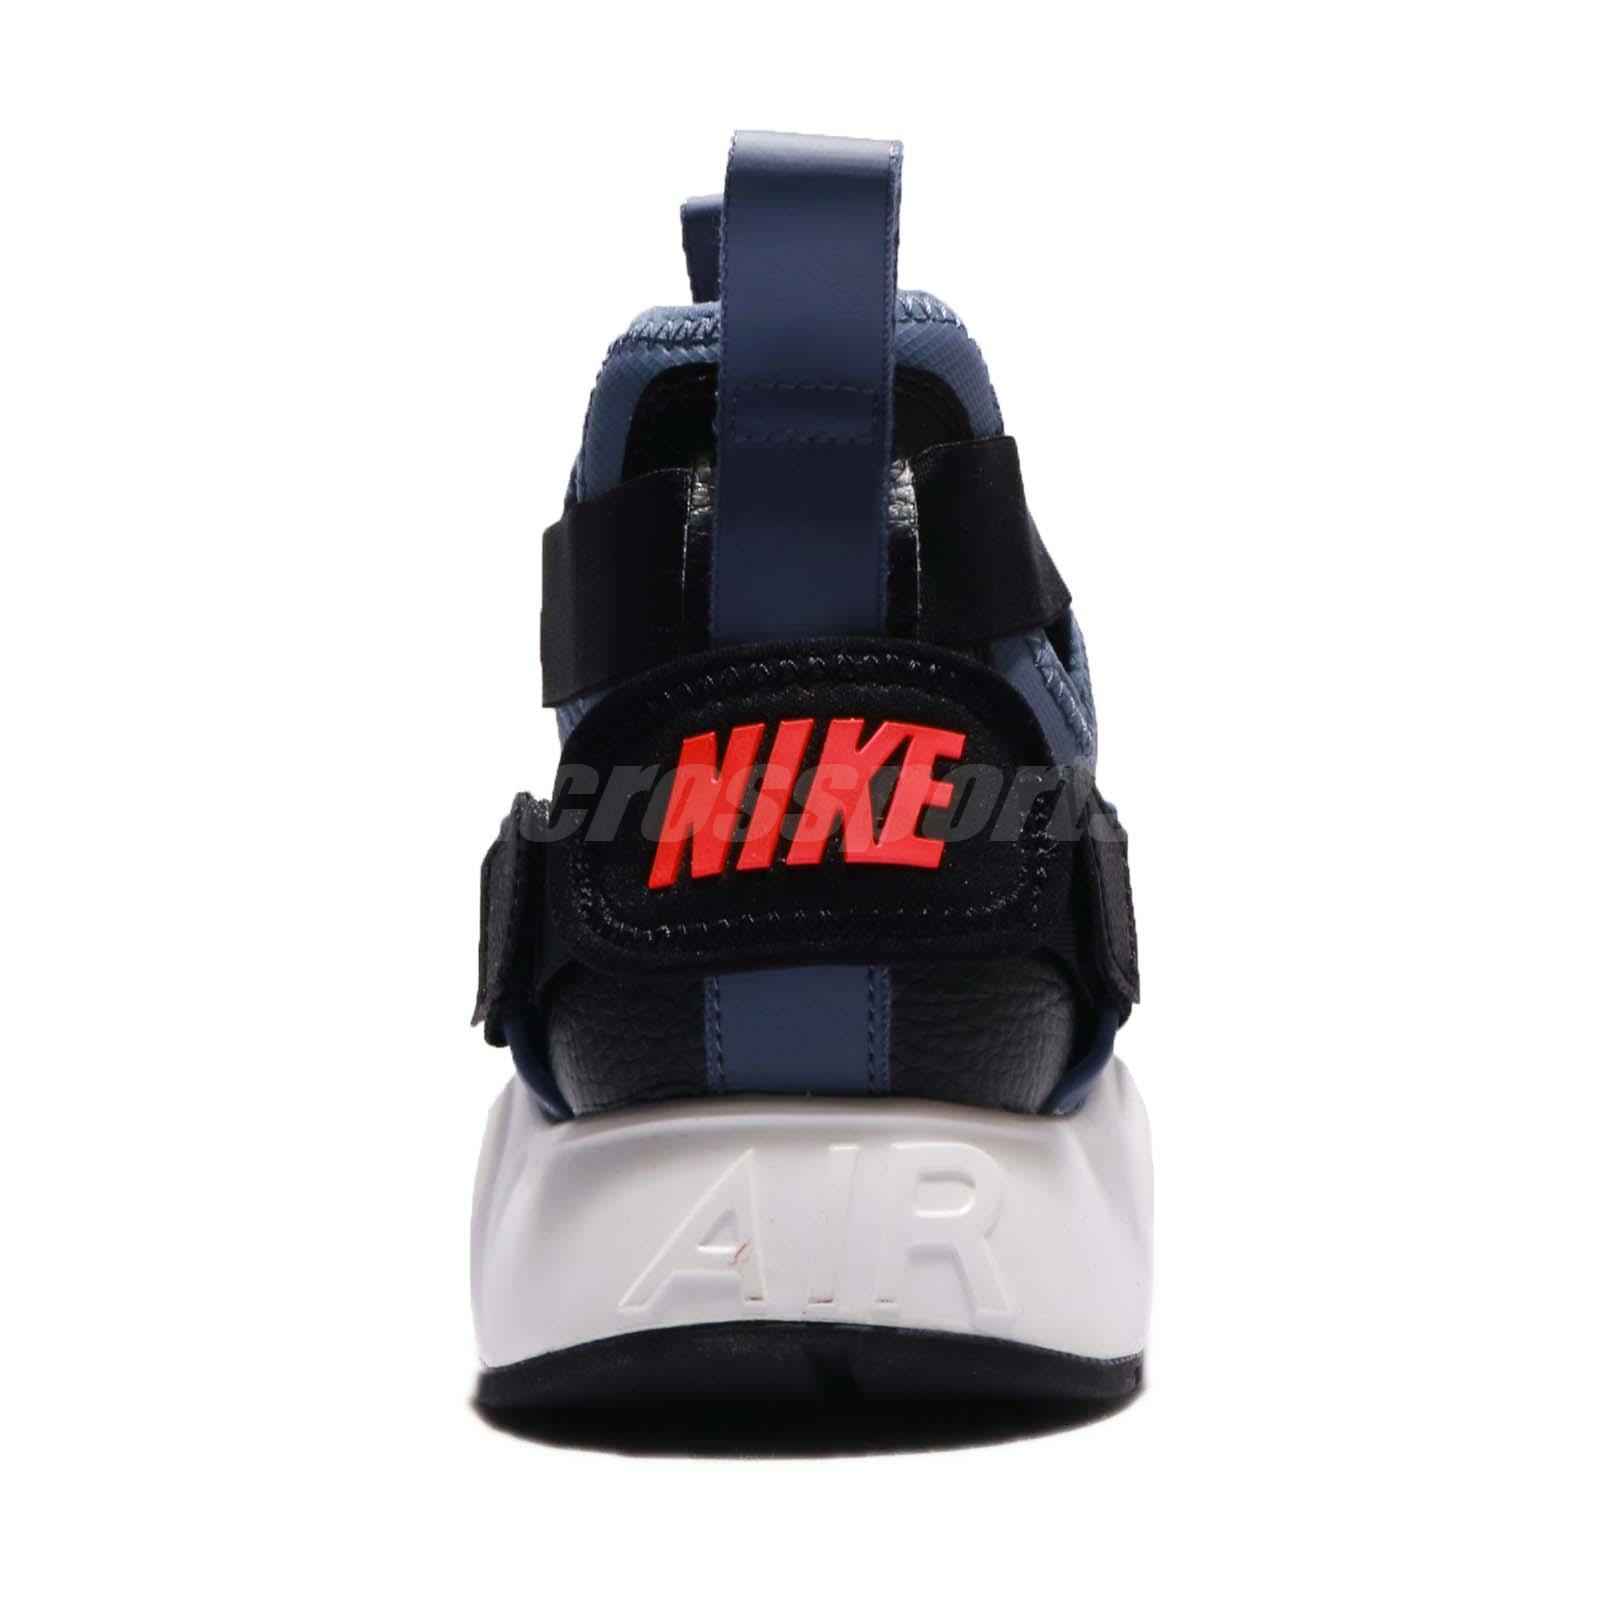 205bd3e23 Wmns Nike Air Huarache City Strap Navy Black Red Women Running Shoes ...